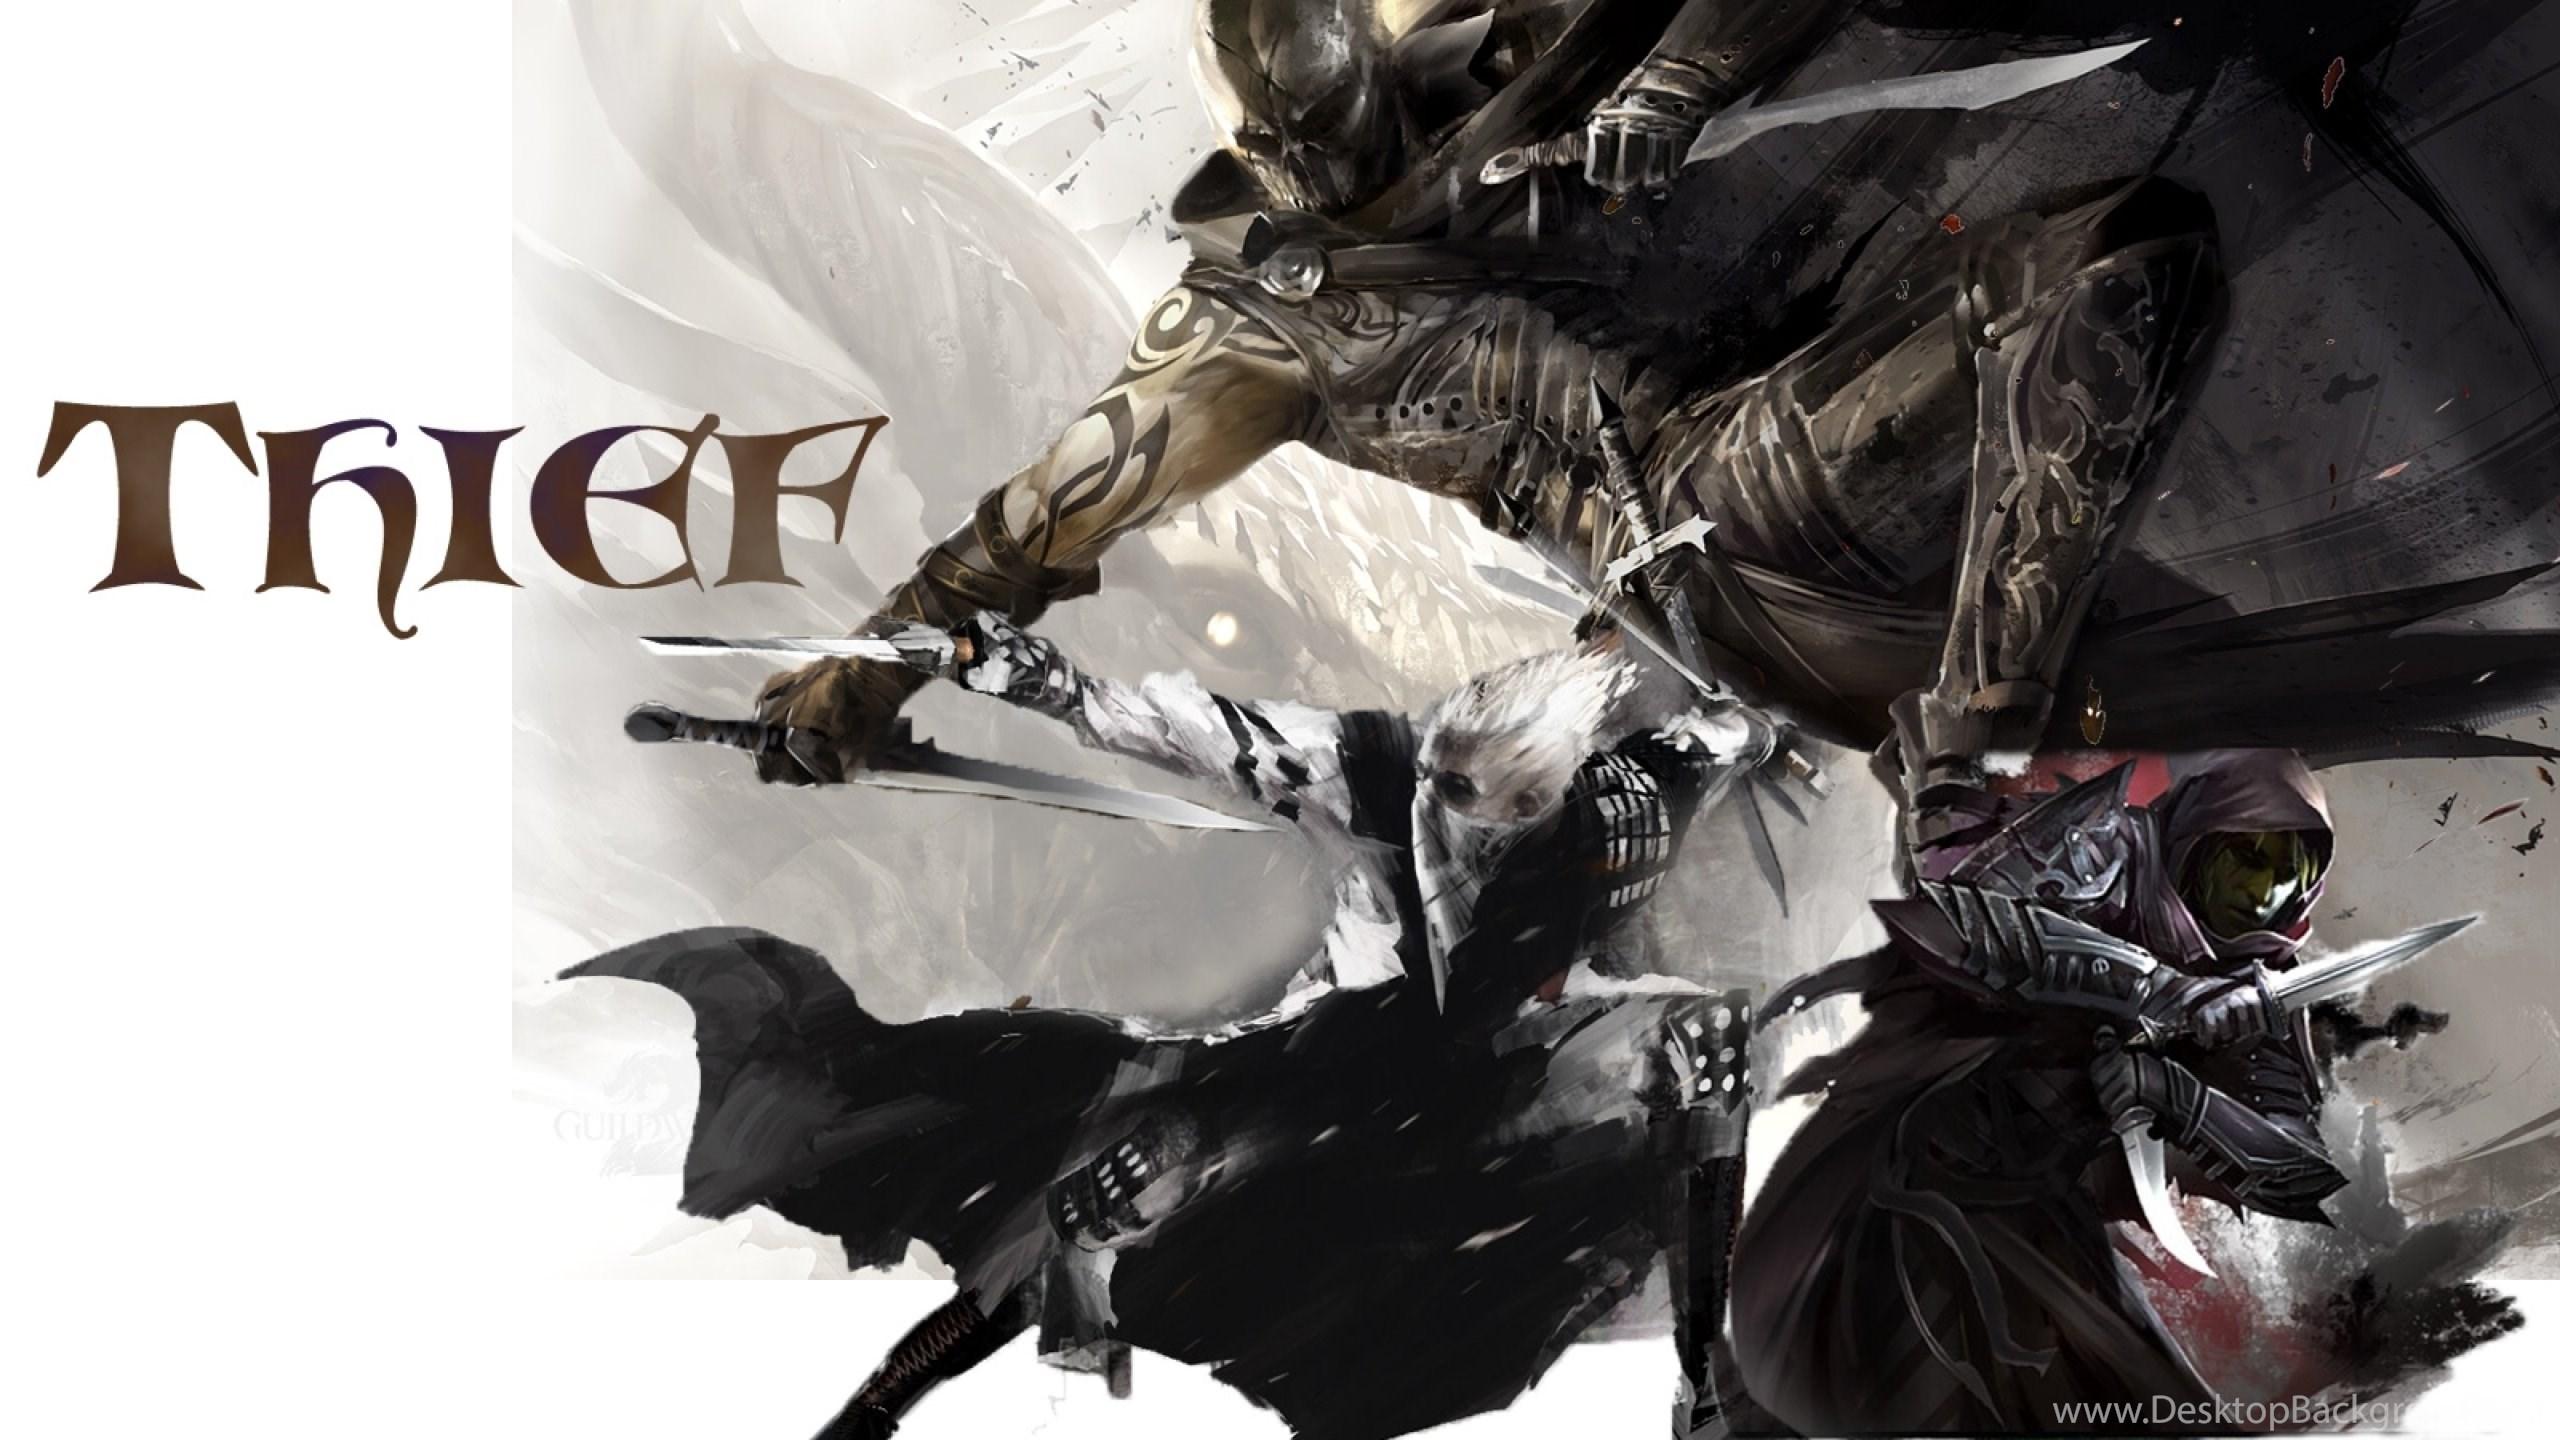 Download Wallpapers Download 2560x1440 Guild Wars 2 Thief Best